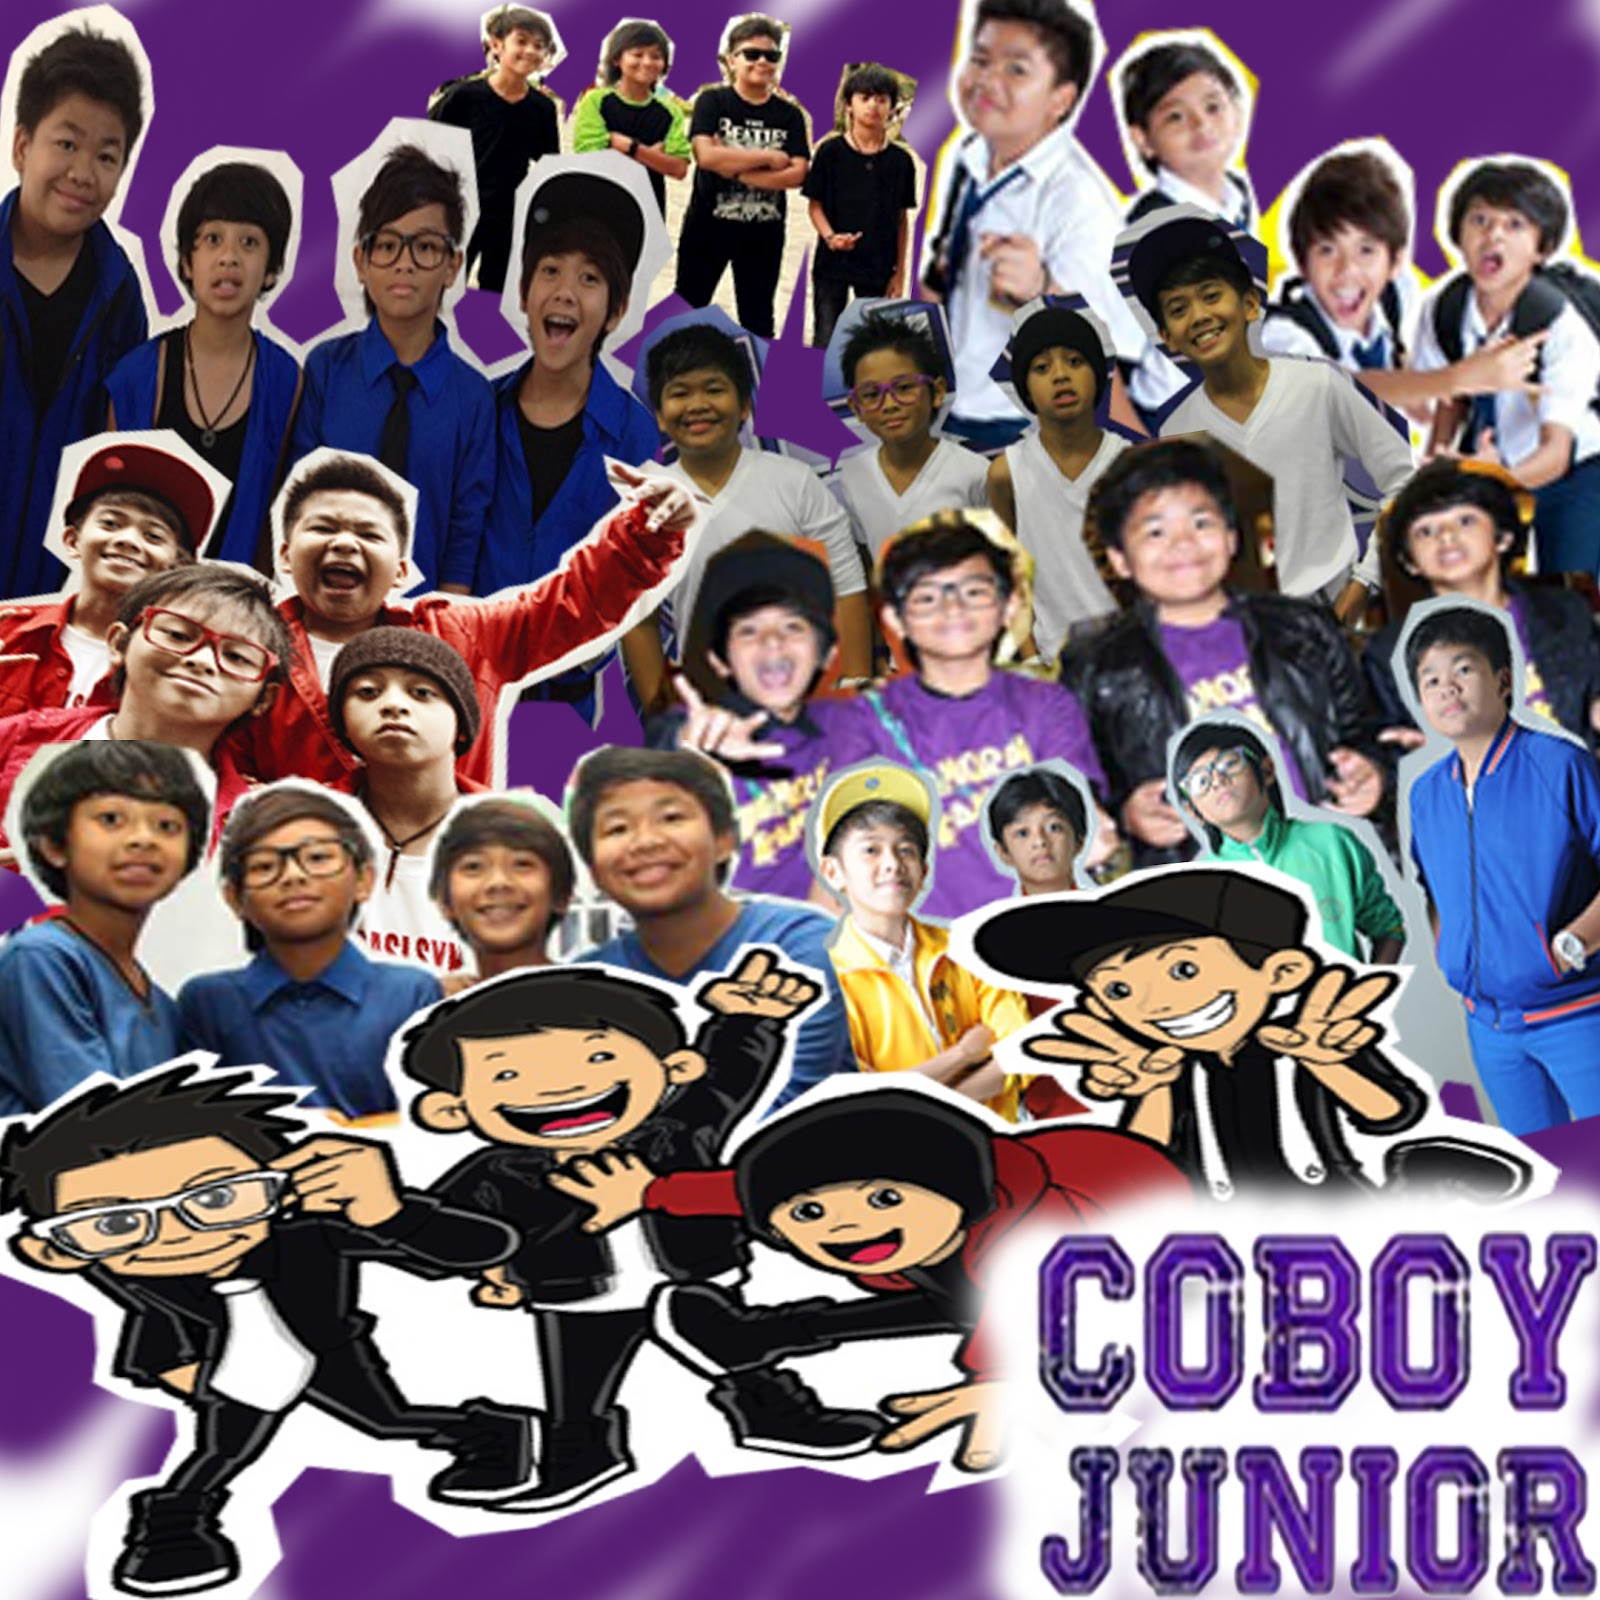 Coboy Junior Iqbal Biodata